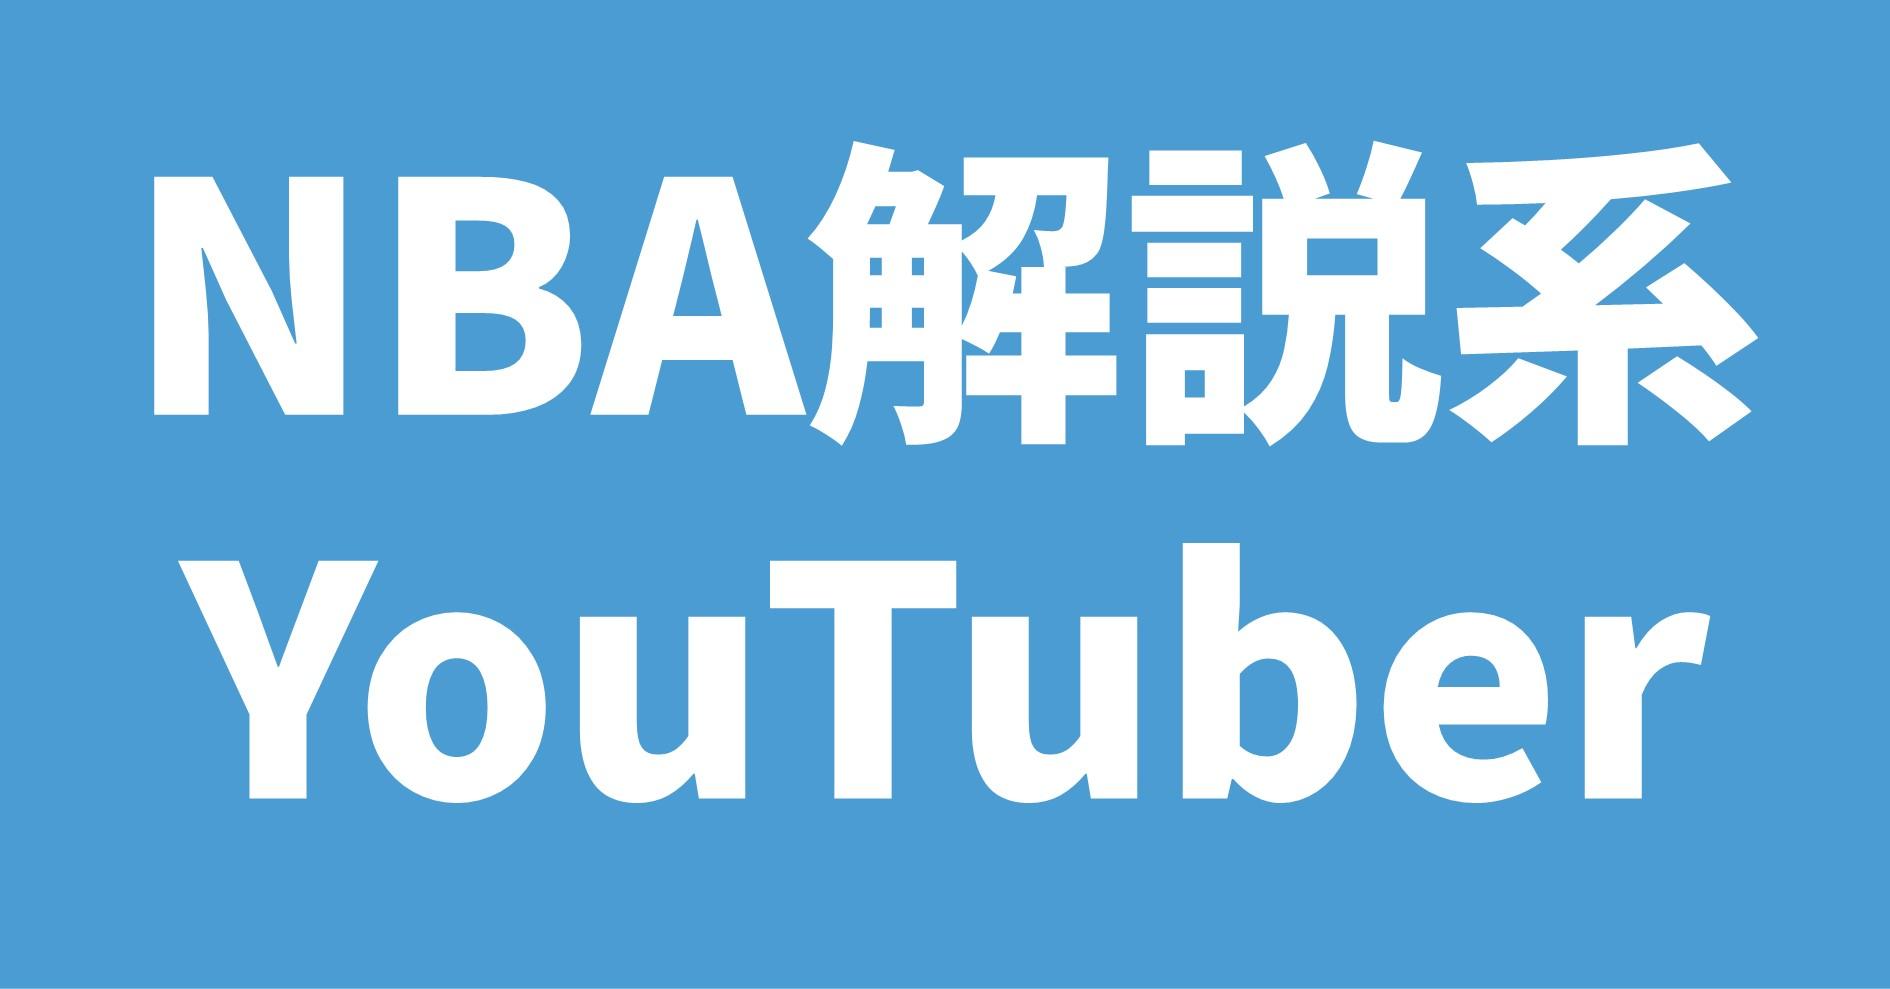 NBA解説系YouTuber